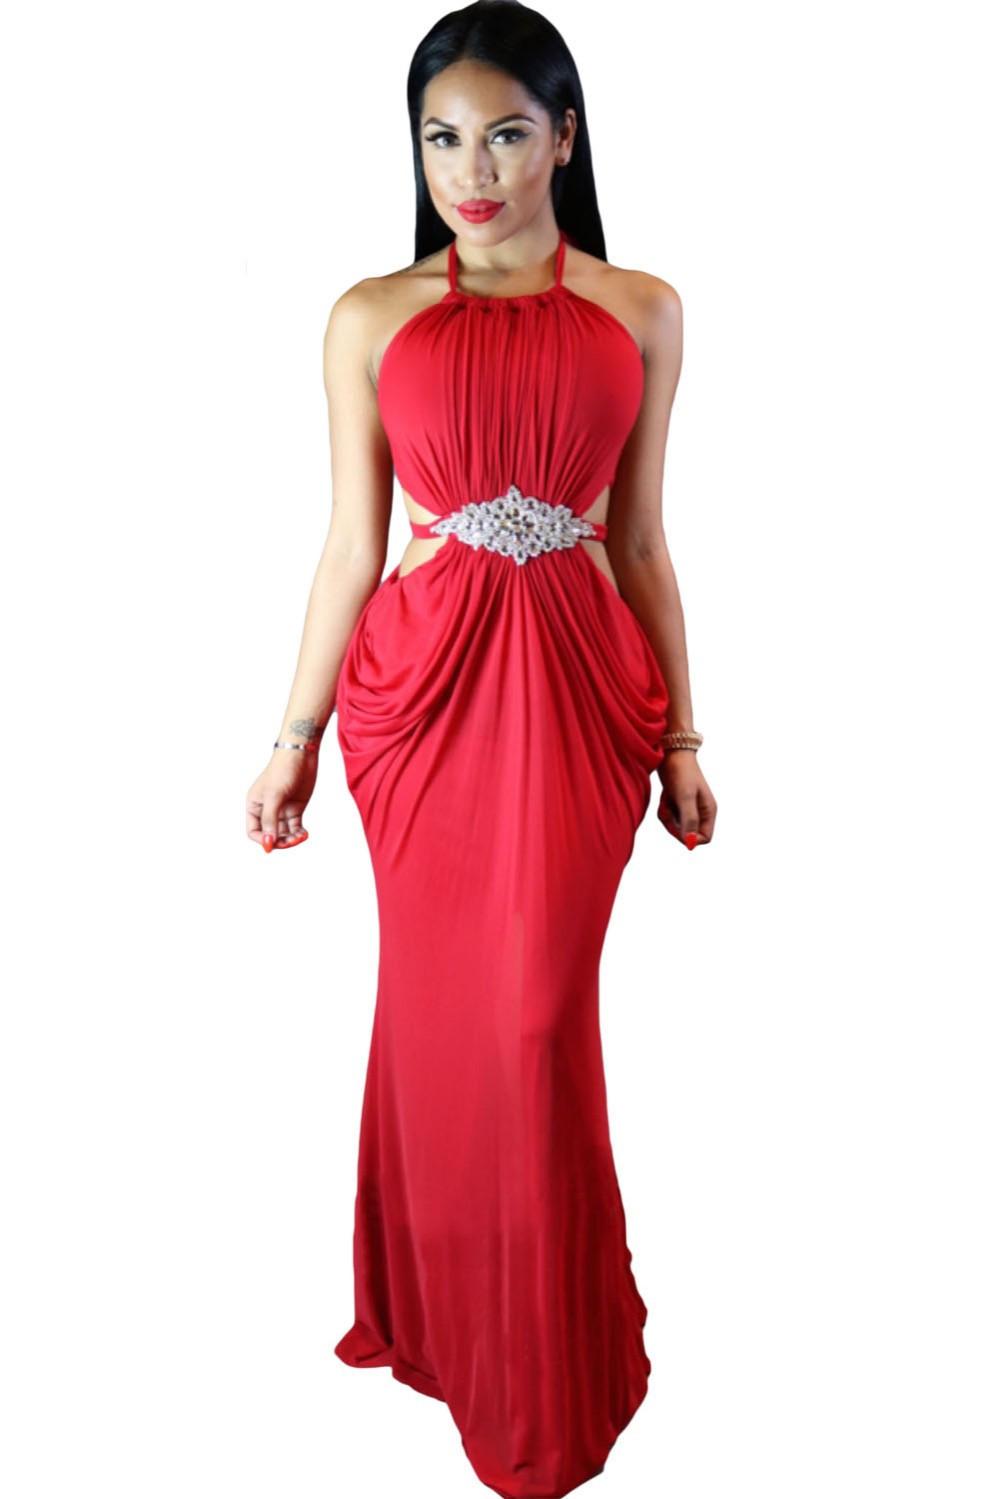 Draped Halter club dresses  at Bling Brides Bouquet - Online Bridal store image 3